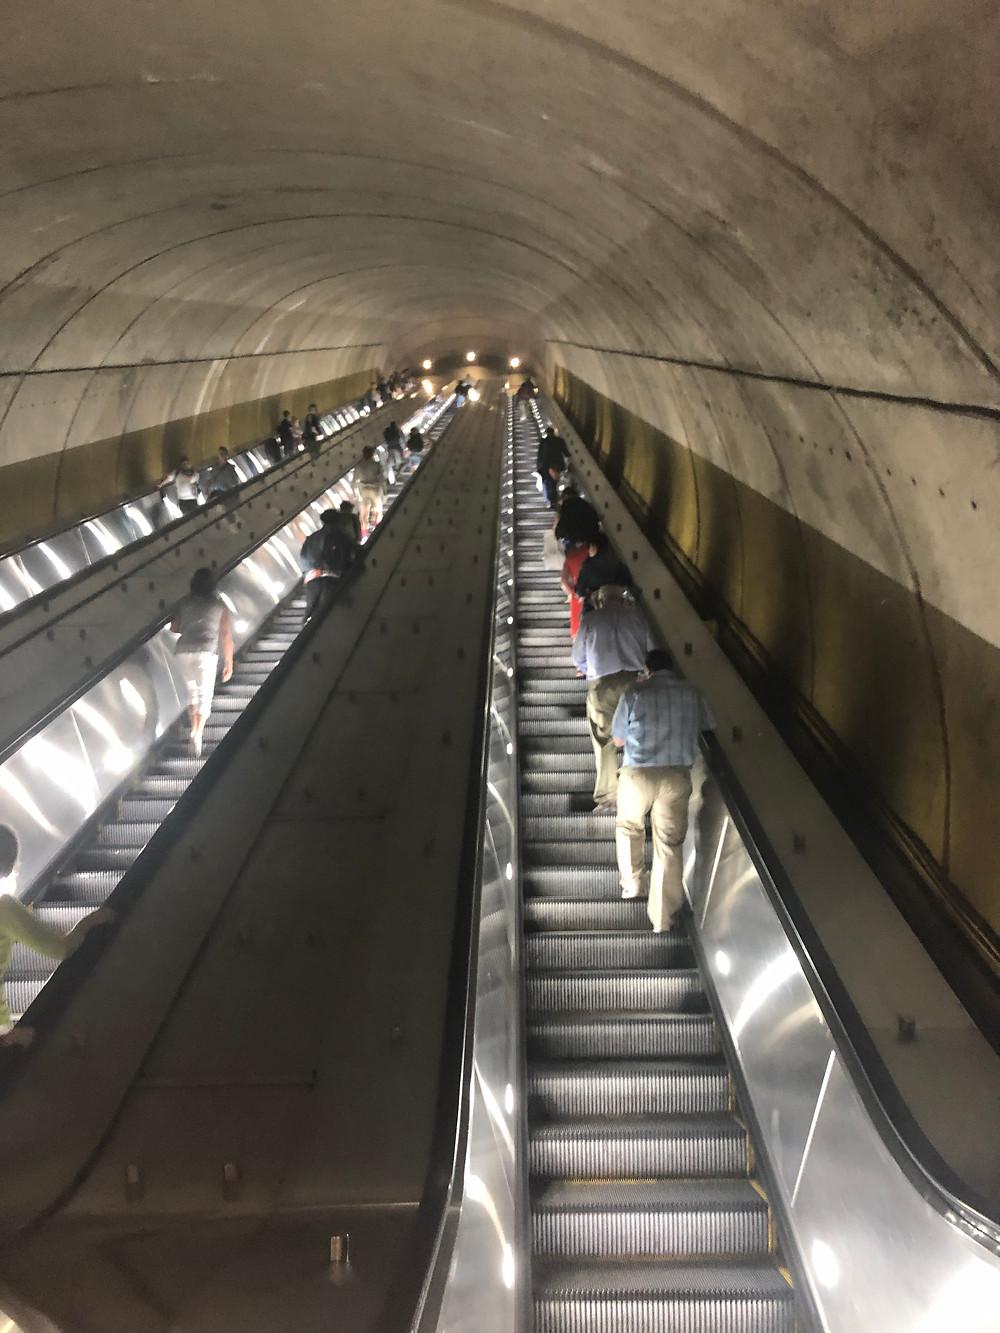 Washington D.C. Subway